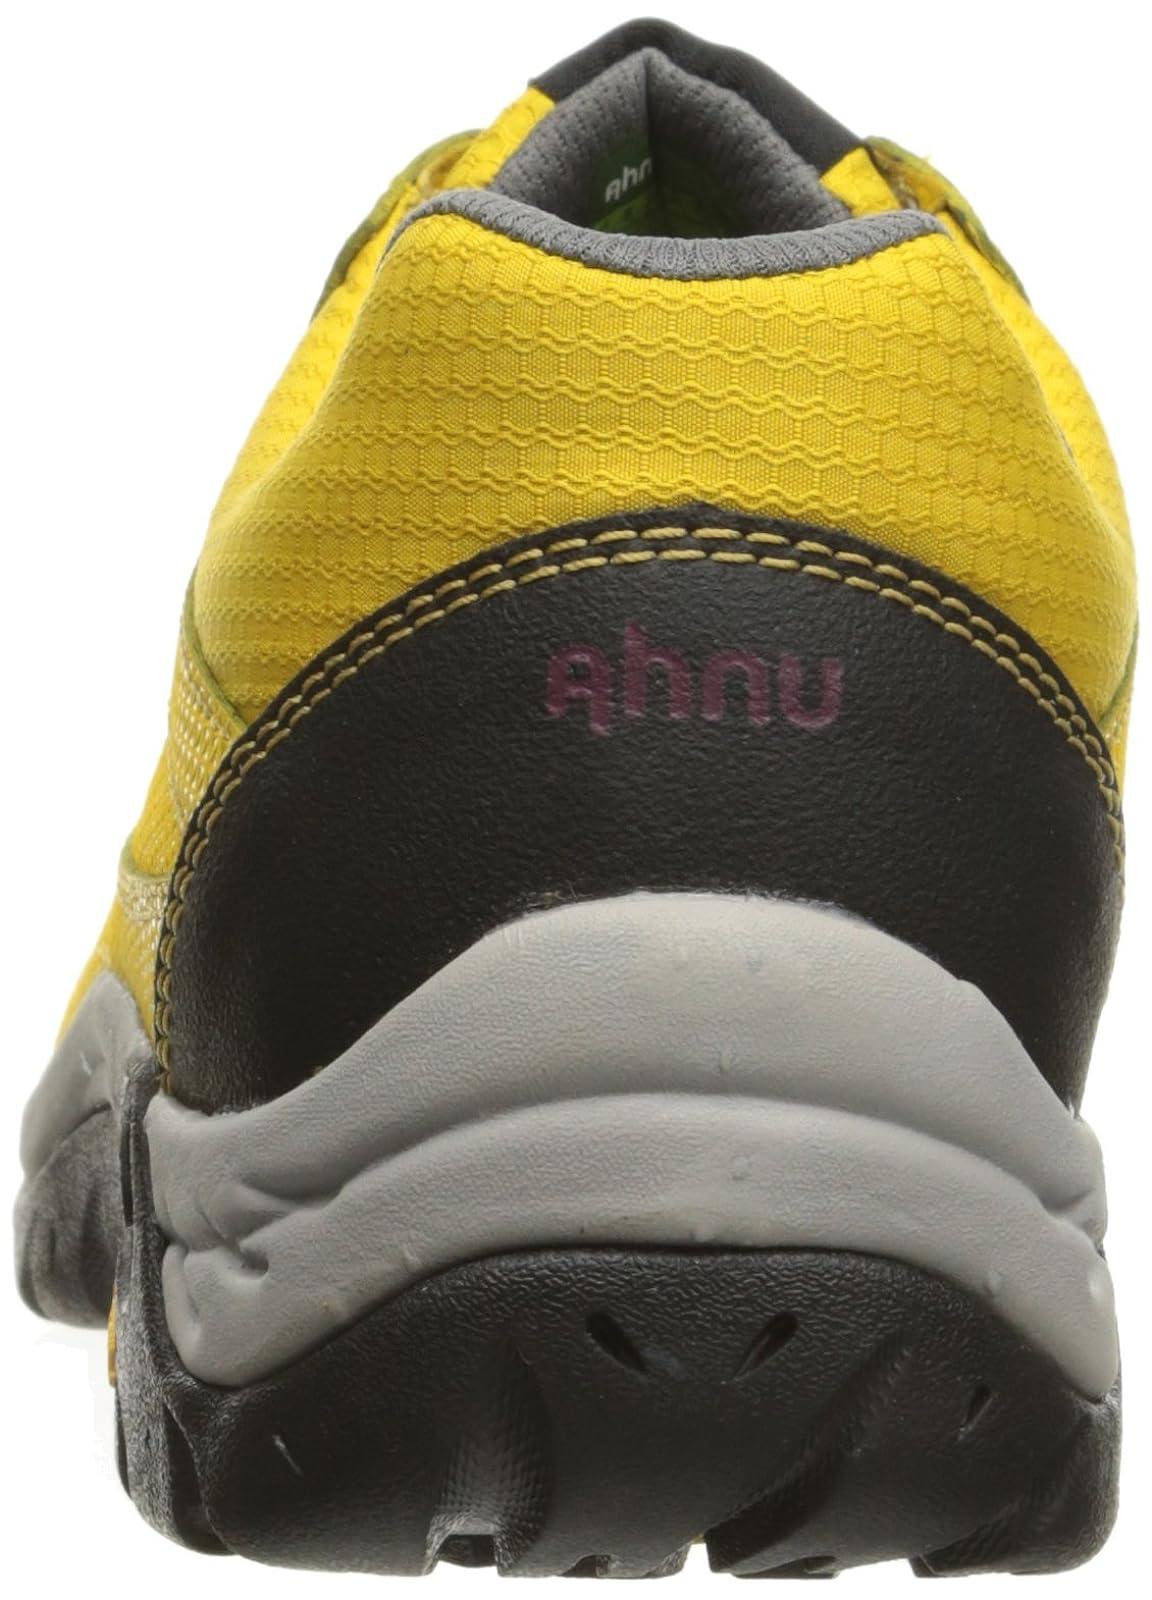 Ahnu Women's Calaveras Waterproof Hiking Shoe 5 M US - 2